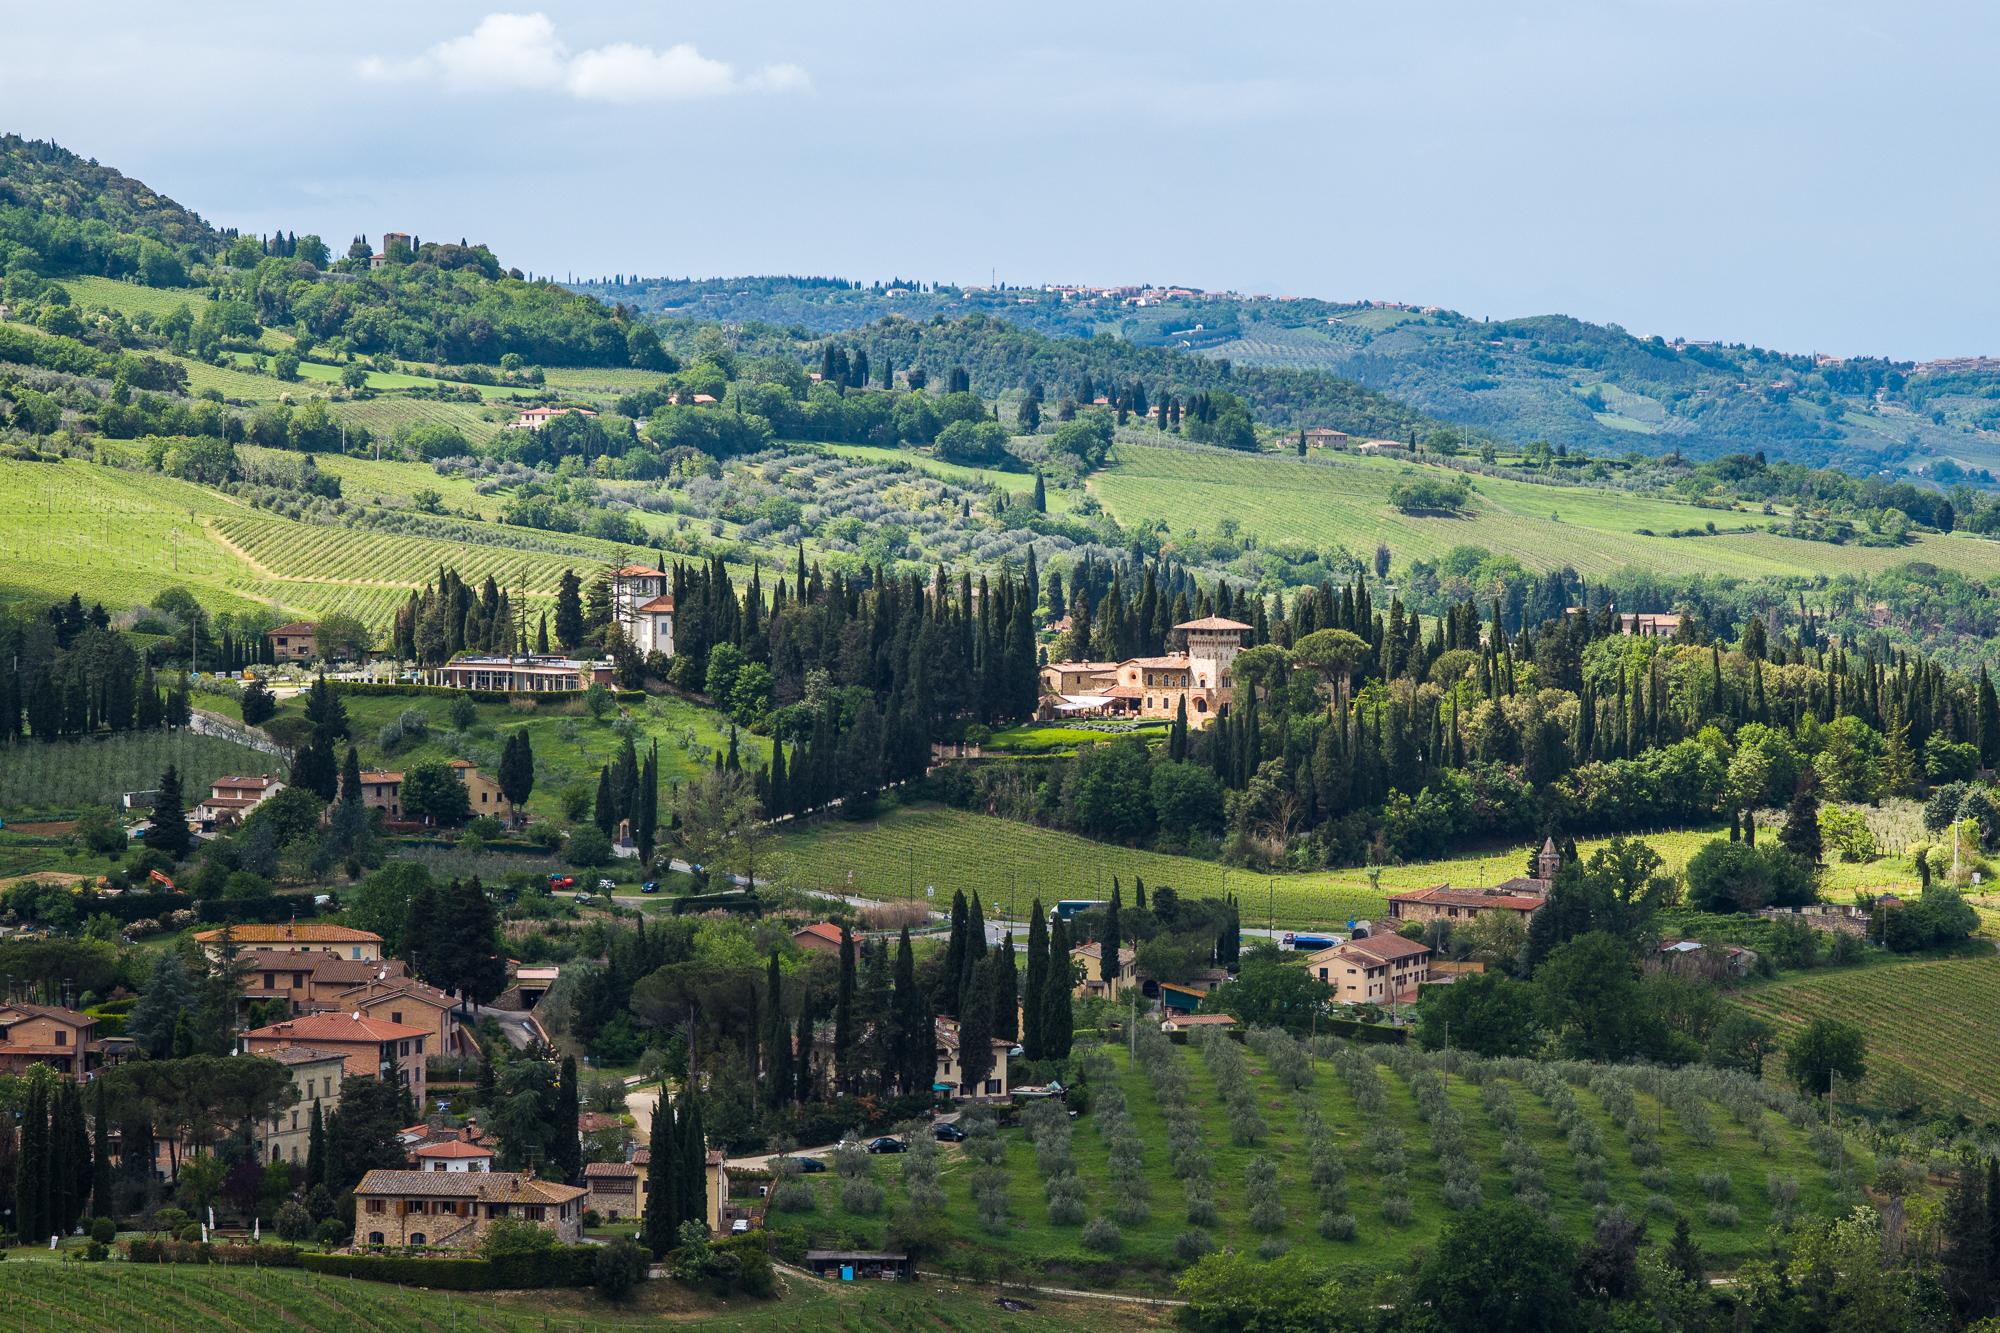 Tuscan hills around San Gimignano